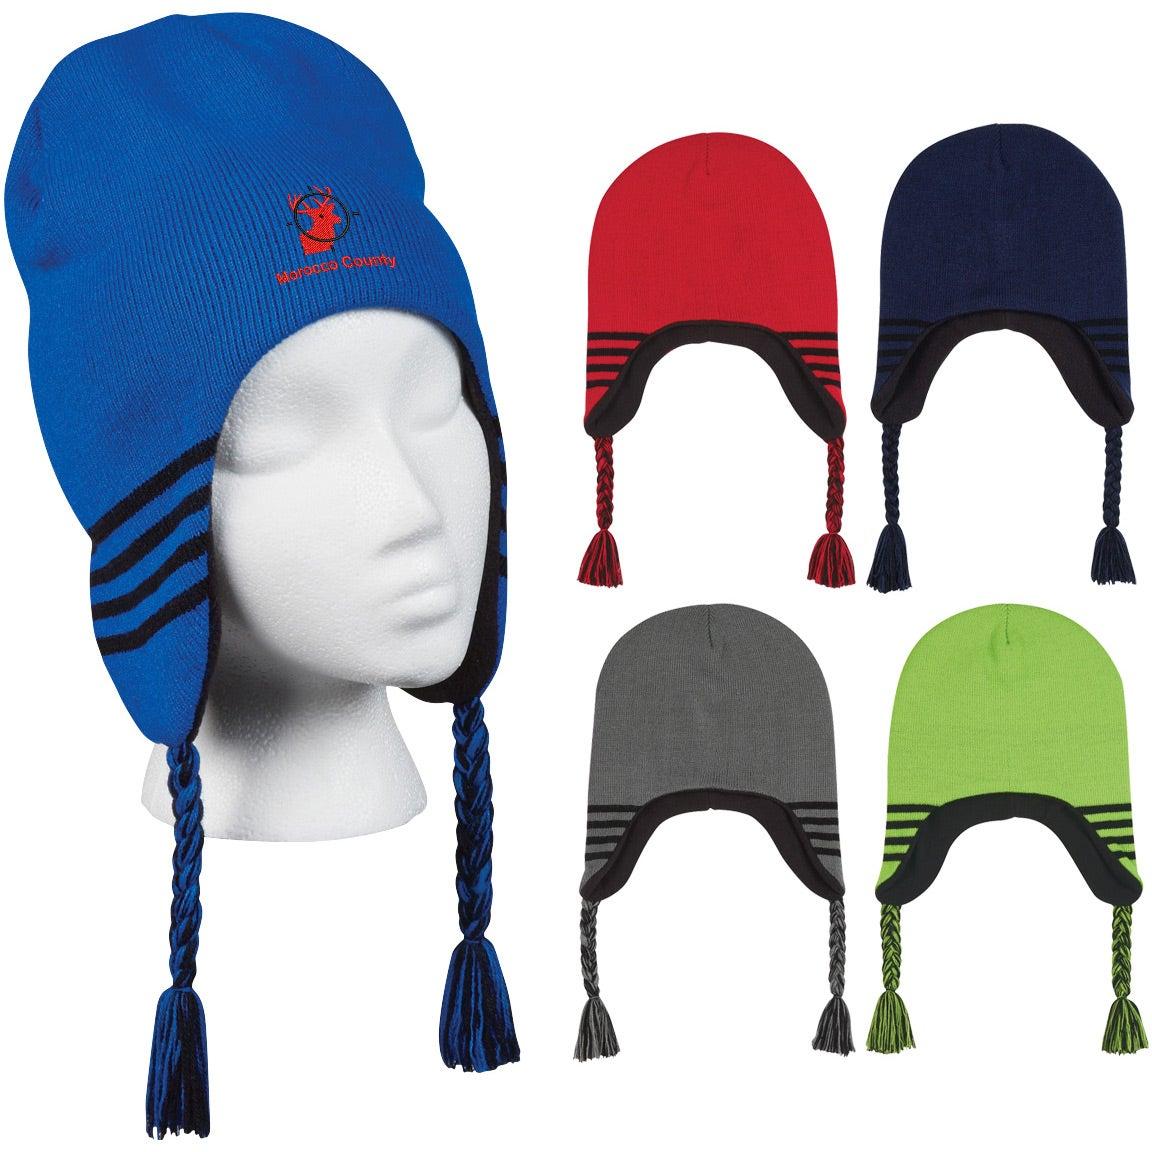 Promotional Ski Beanie With Ear Flaps with Custom Logo for  4.67 Ea. 3769e660005